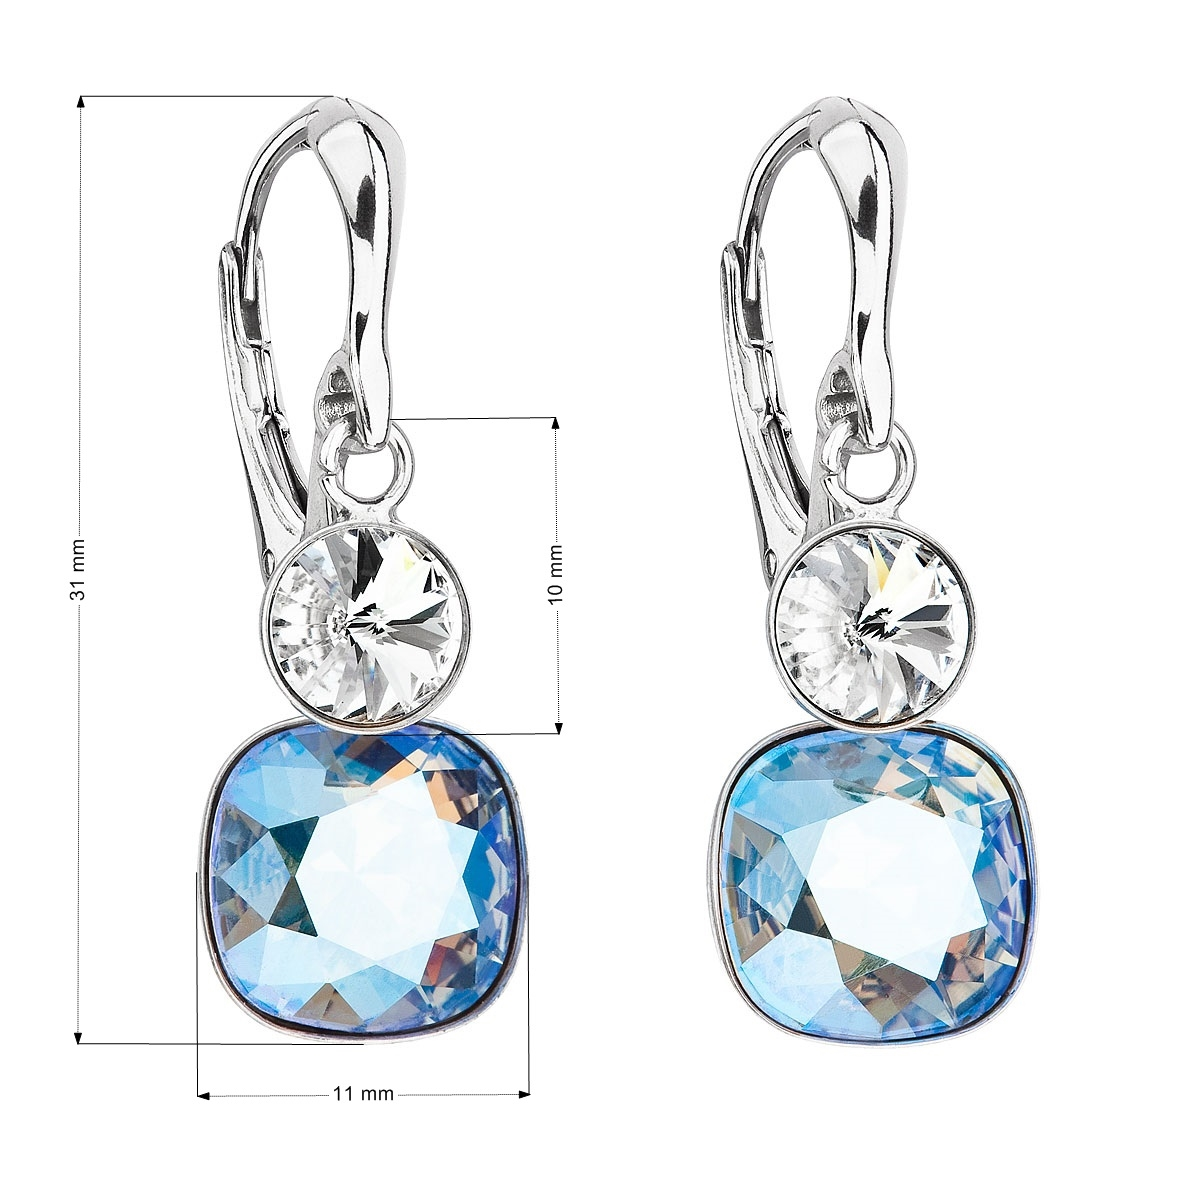 ebbc8de4a Strieborné náušnice s kameňmi Crystals from Swarovski ® Crystal, Light  Sapphire Shimmer